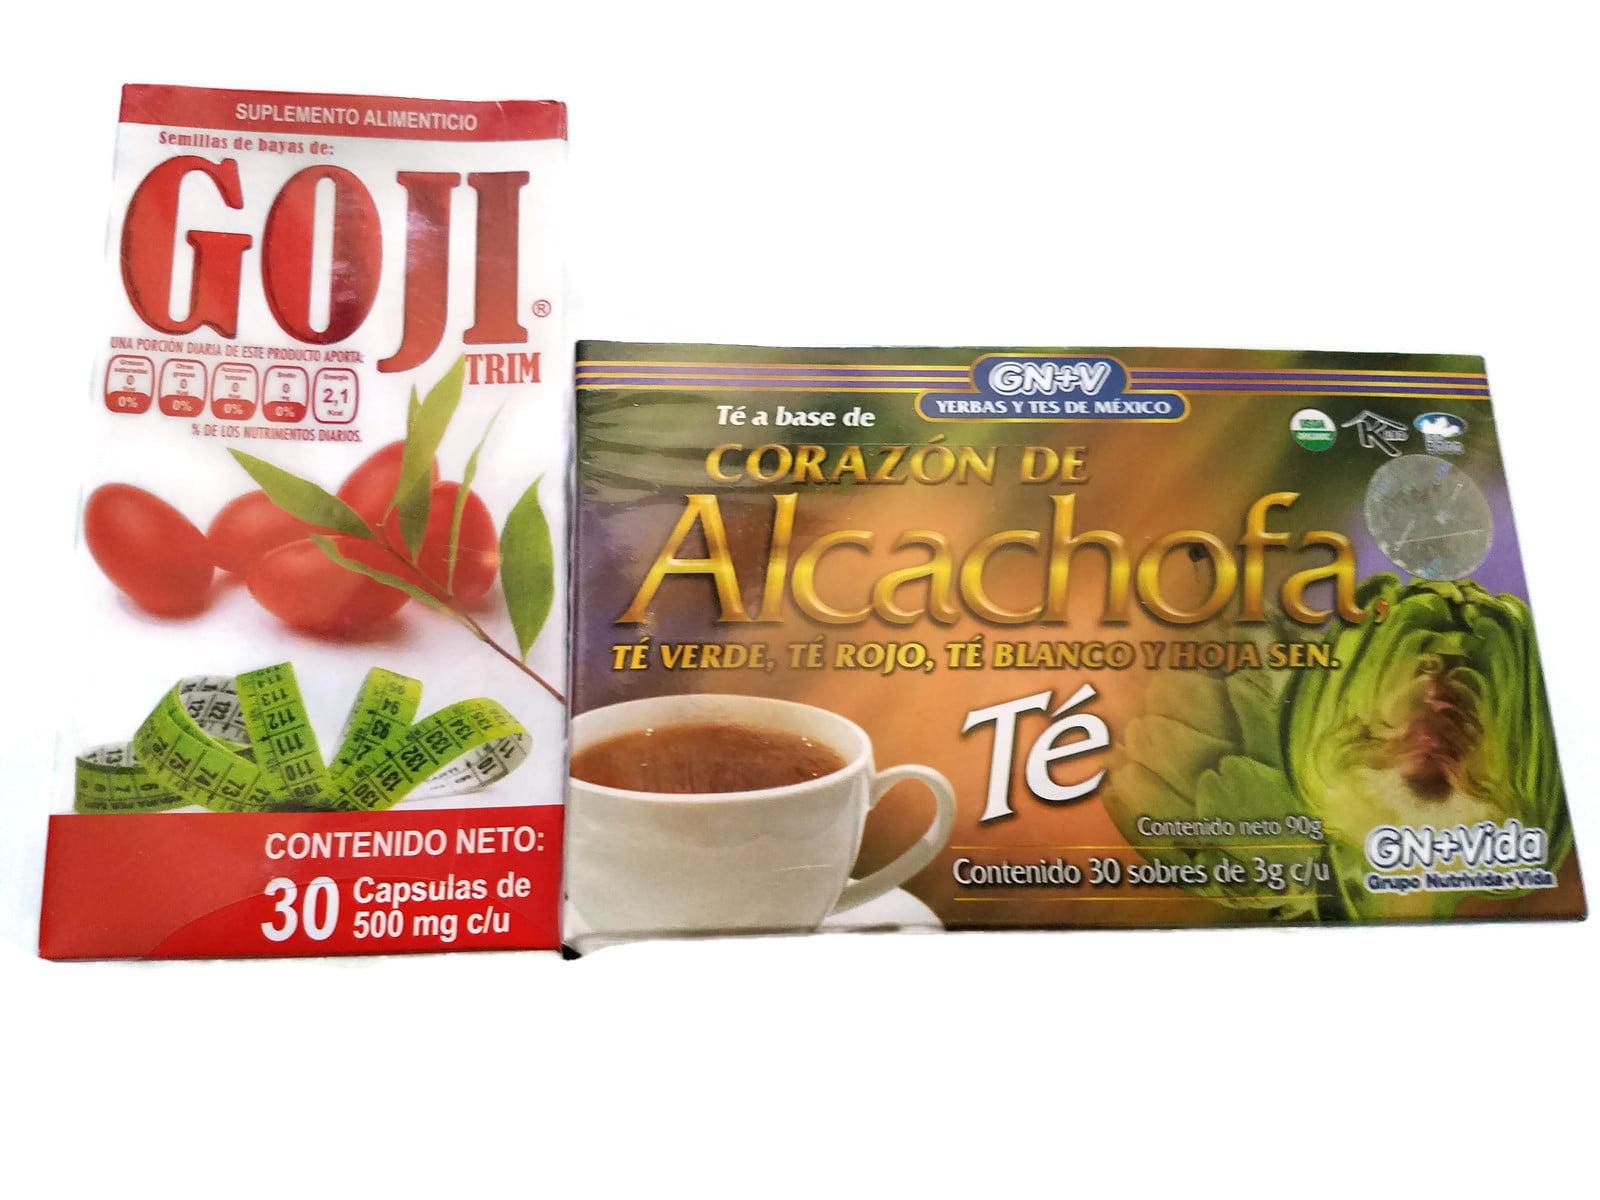 Alcachofa Tea Y Goji Trim Weight Loss Set 30 Day Supply